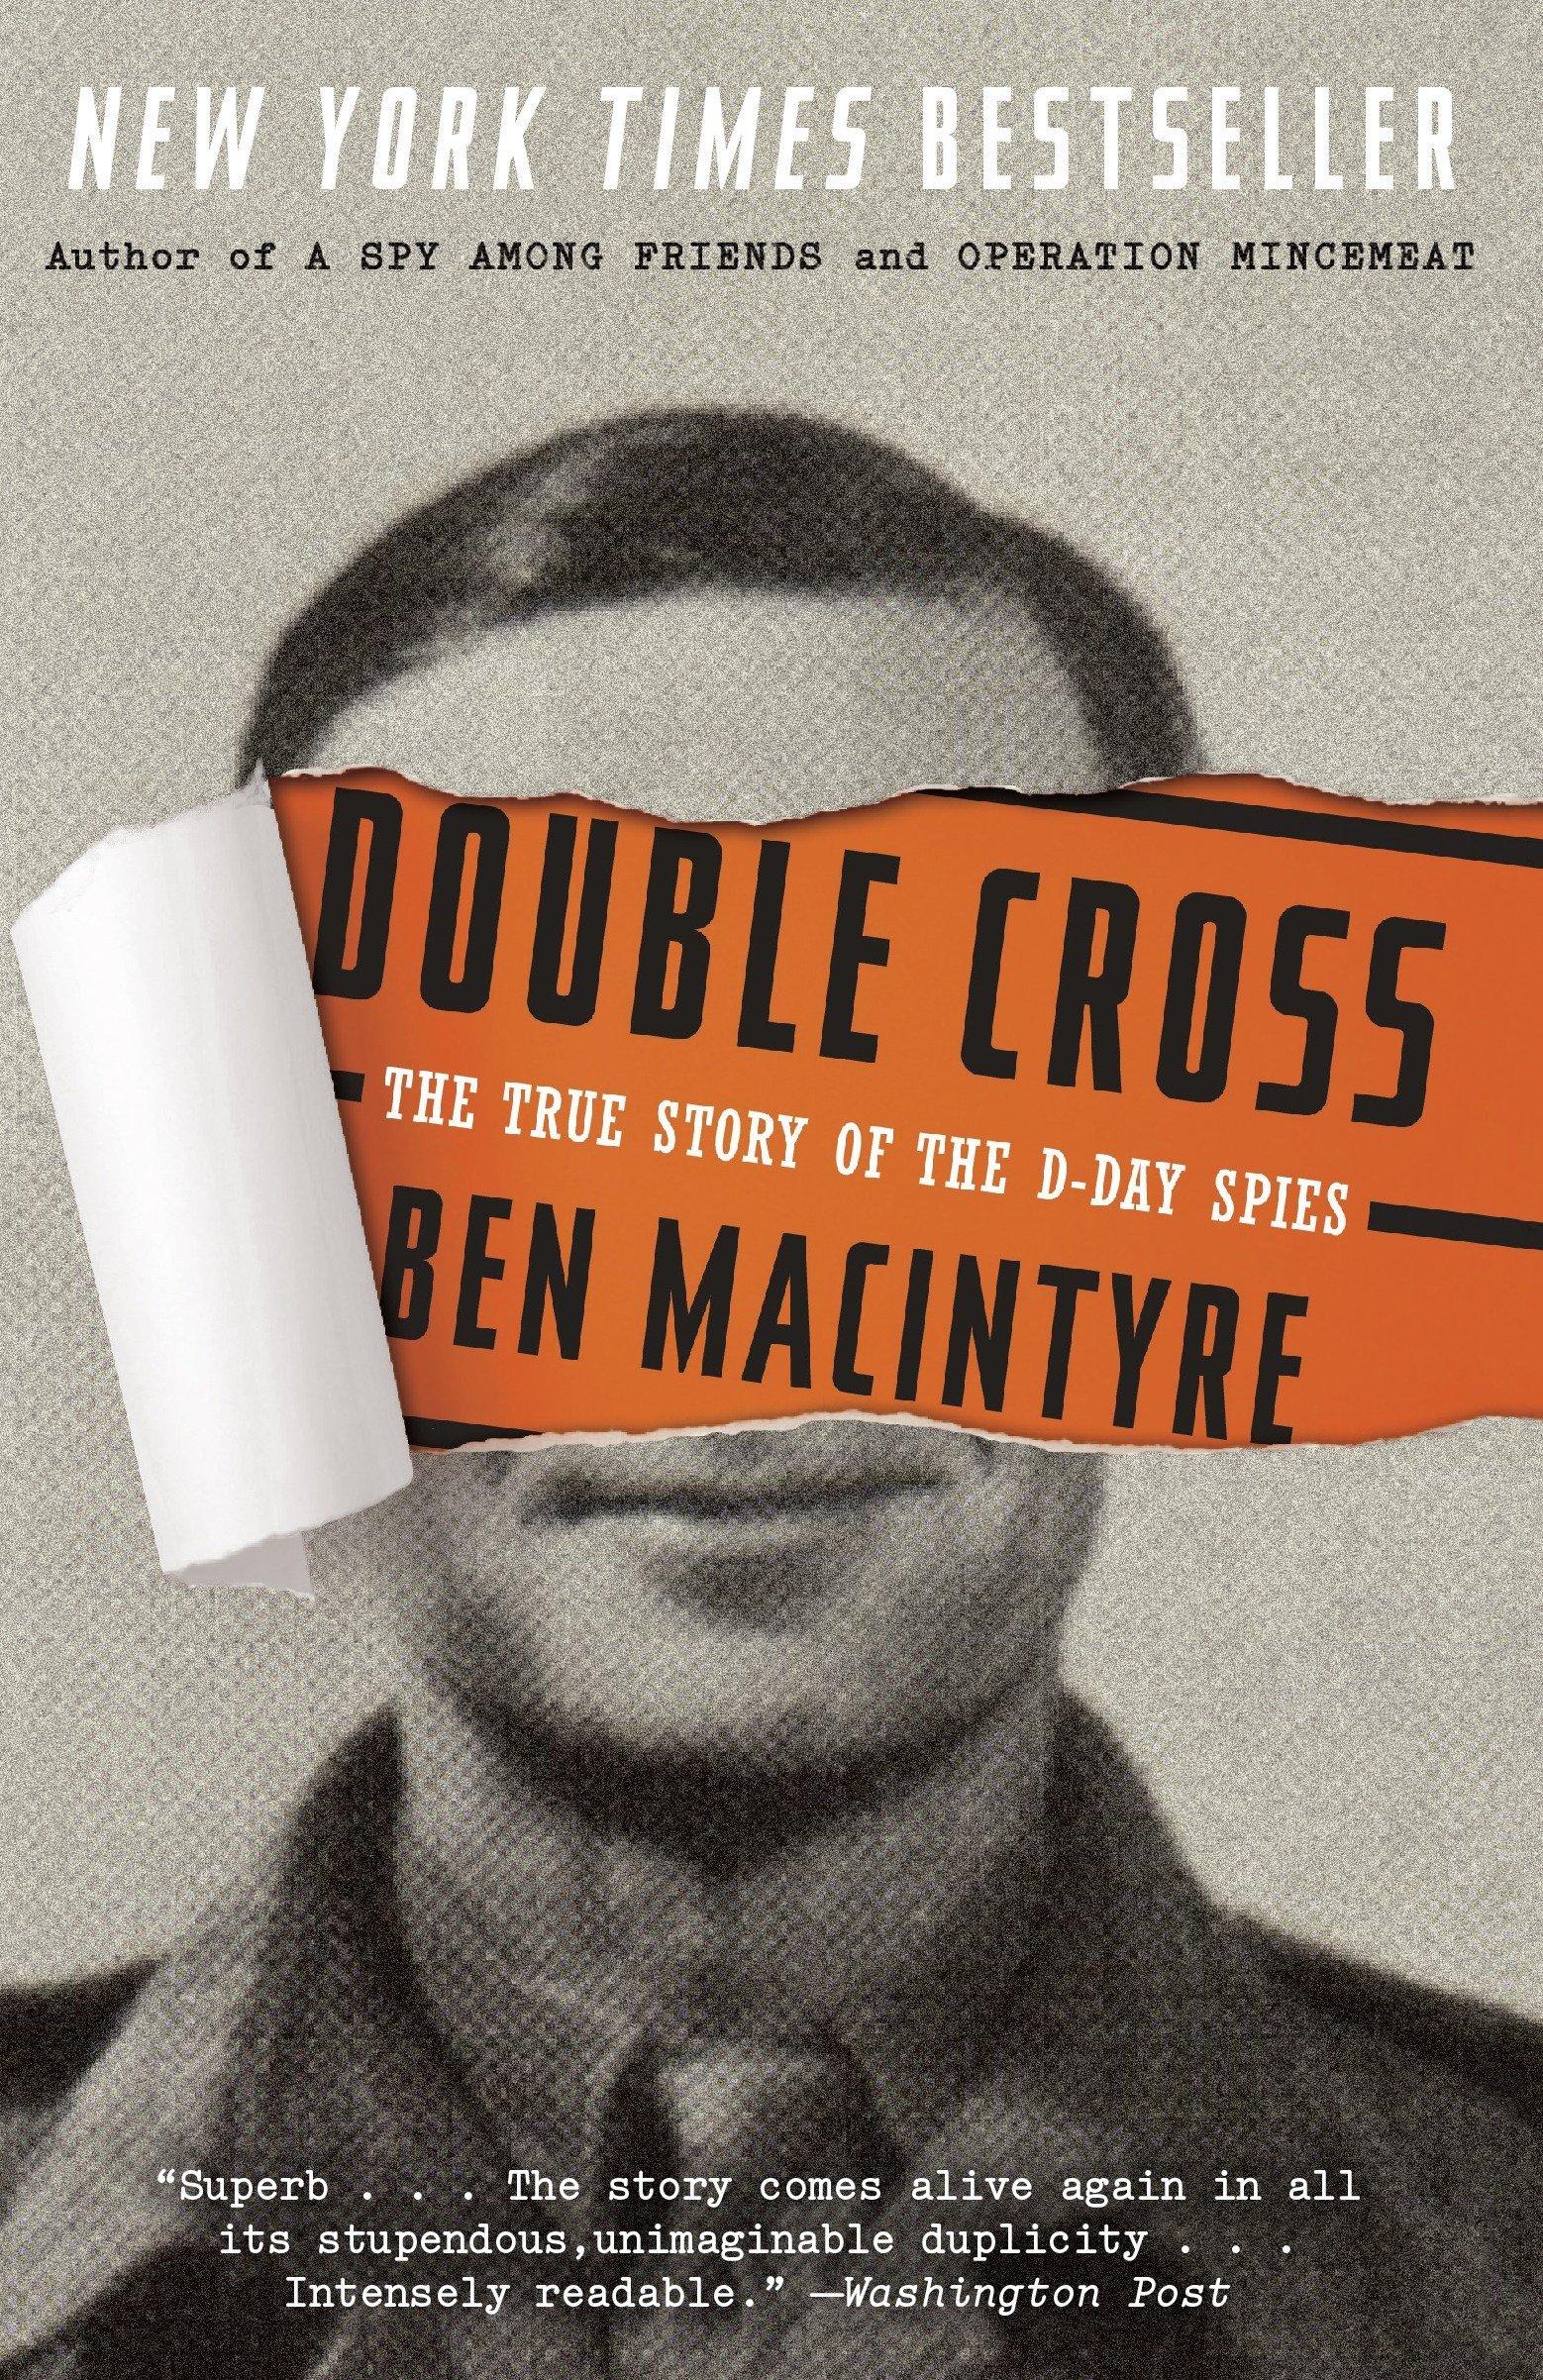 Double Cross: The True Story of the D-Day Spies: Amazon.es: Ben Macintyre: Libros en idiomas extranjeros